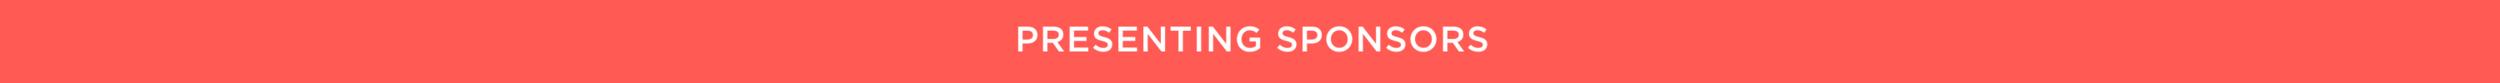 Calgary 2019 Sponsor Banners.png